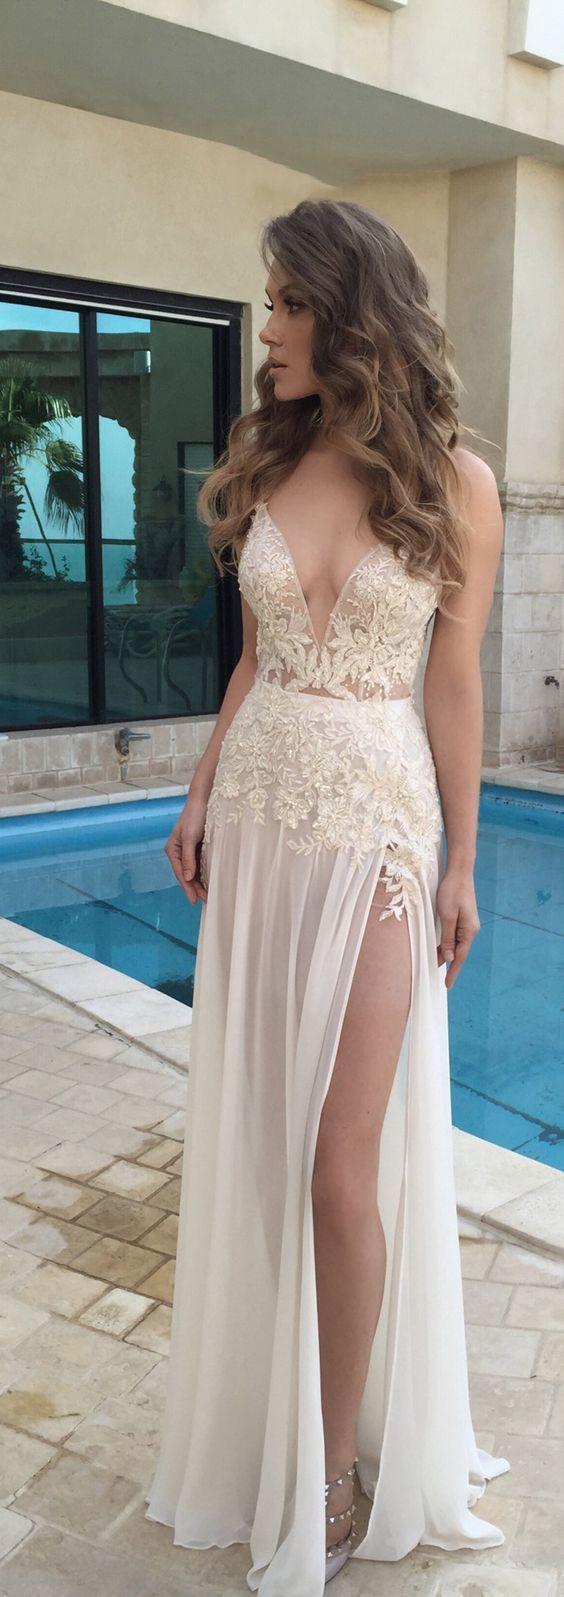 deep v-neck long prom dress applique sleeveless evening dress with high slit,HS268 #EveningDresses